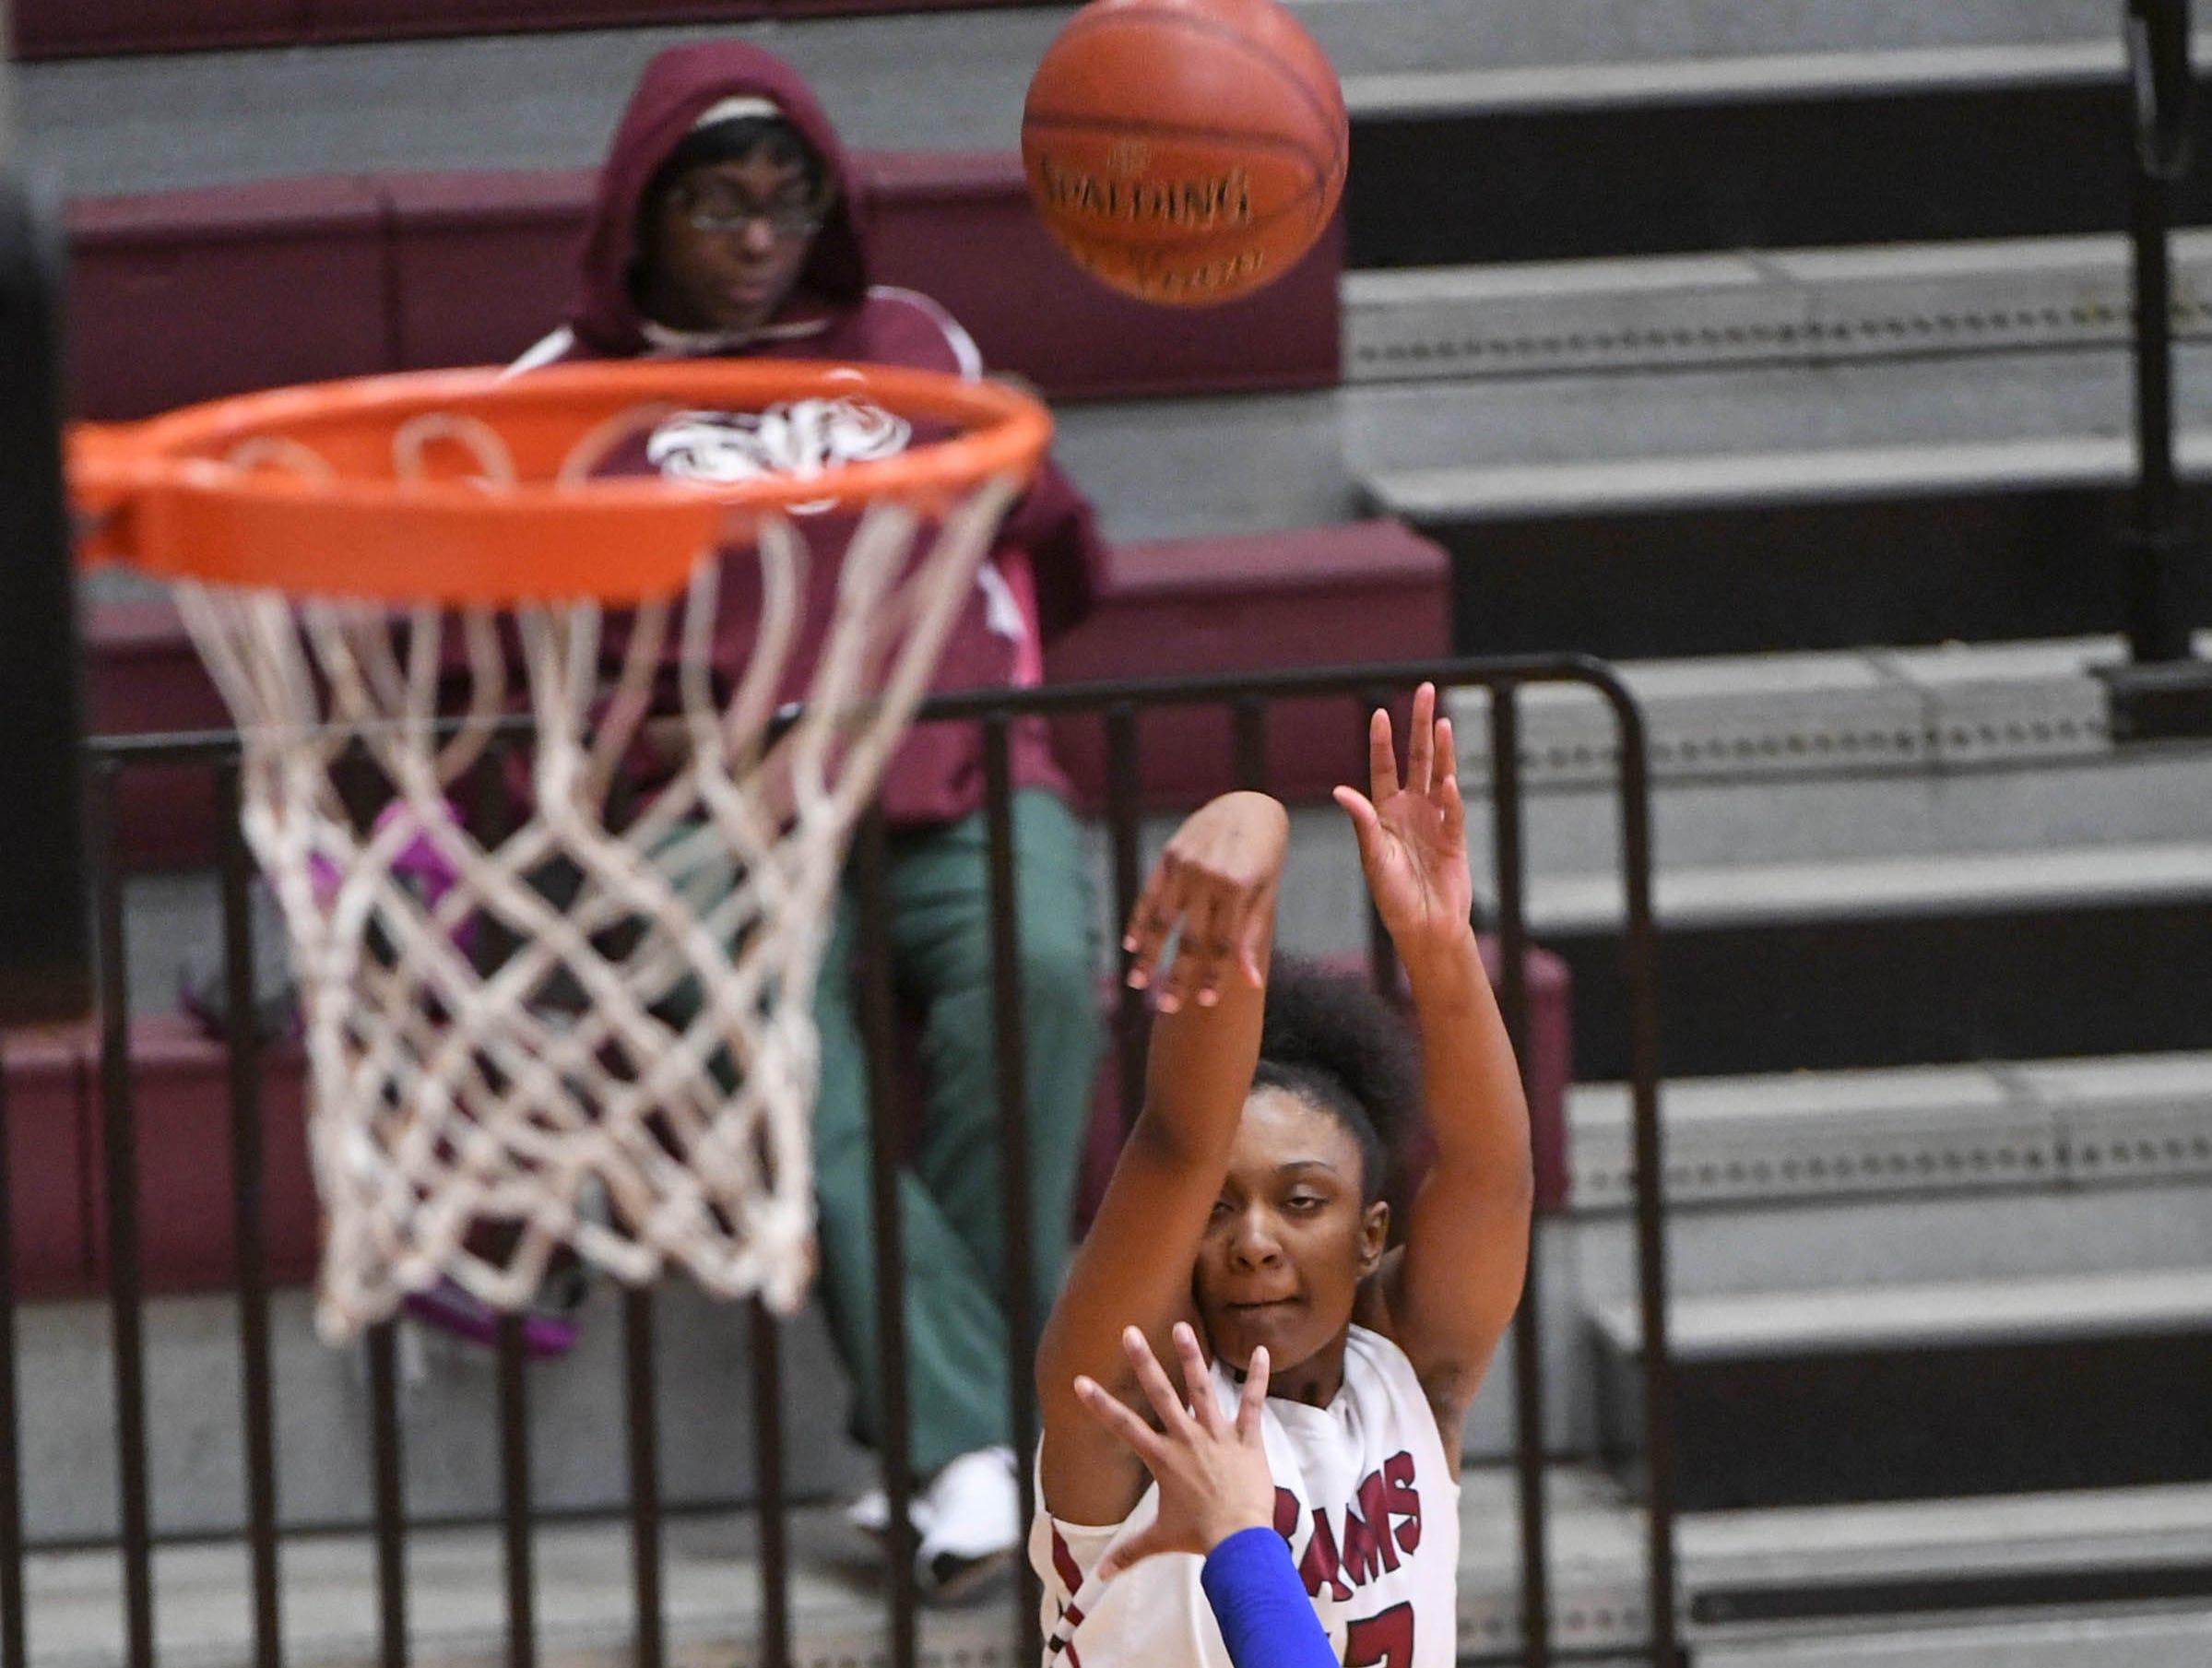 Westside freshman Branya Pruitt(12) shoots near Woodmont senior Kitara Henry(33) during the third quarter at Westside High School in Anderson on Tuesday.